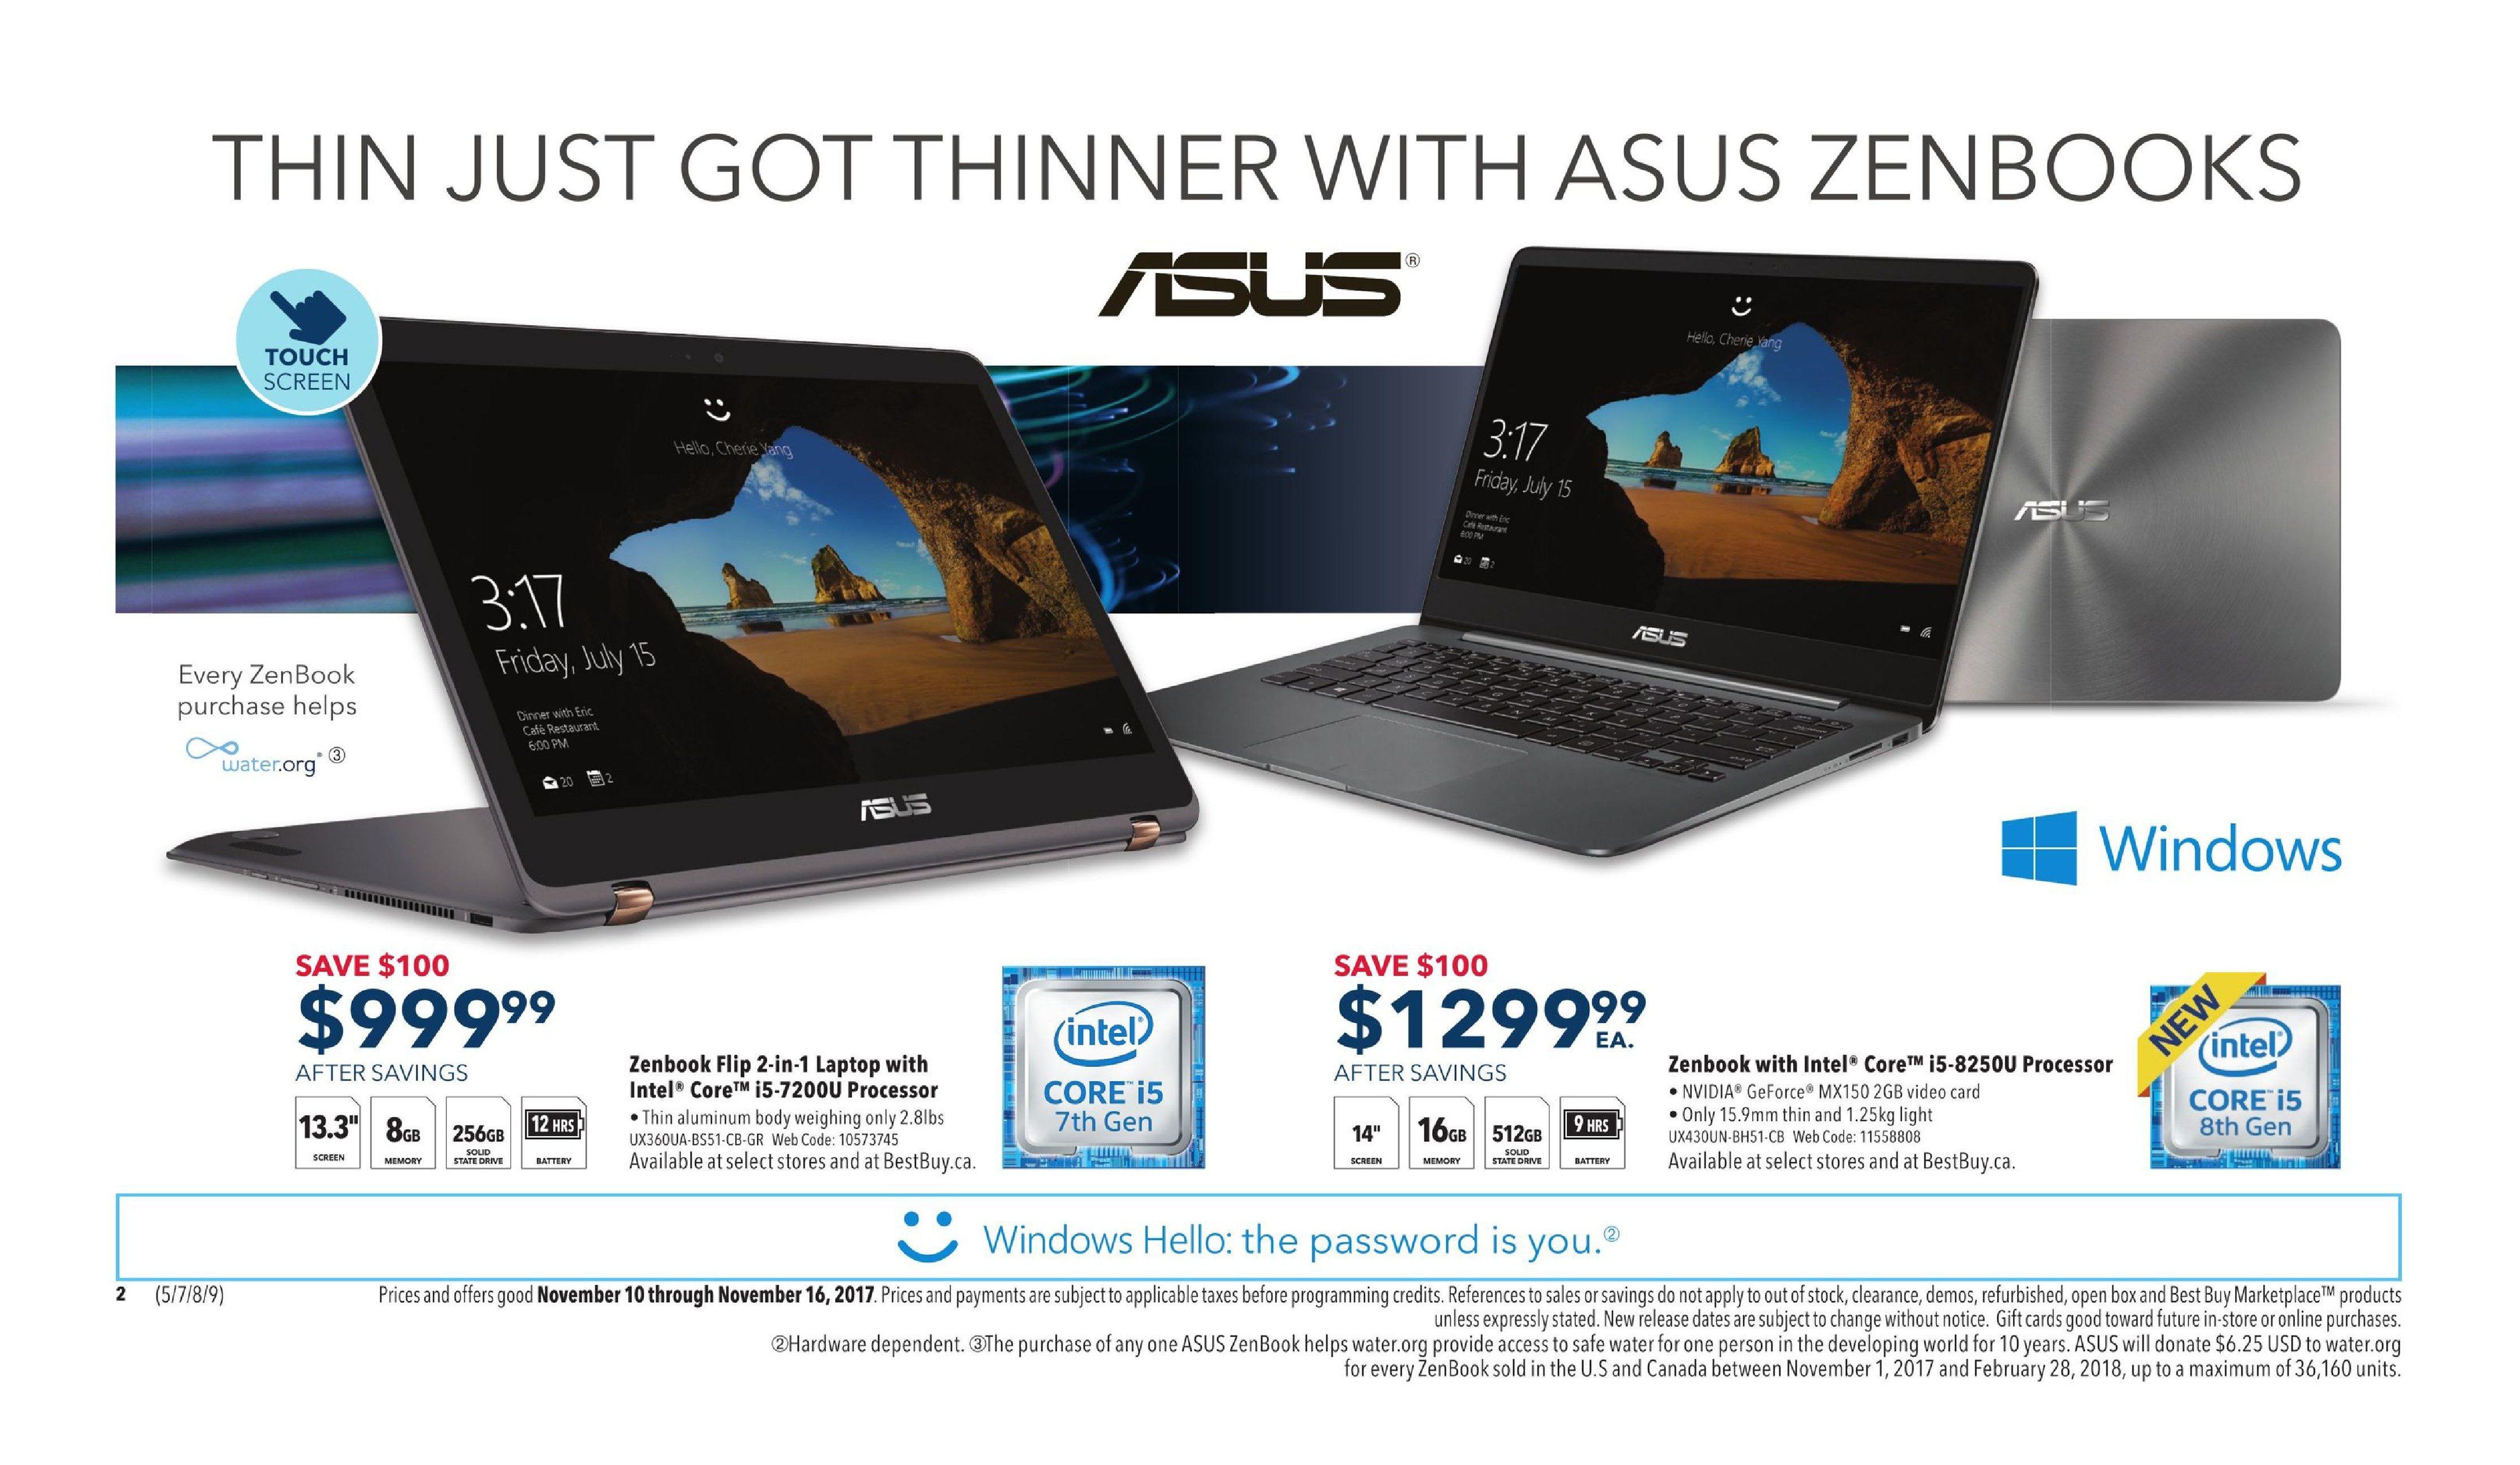 Best Buy Weekly Flyer Get Amazing Deals On Dazzling Gifts Sdxc 512gb V Gen Turbo Class 10 Uhs1 Nov 16